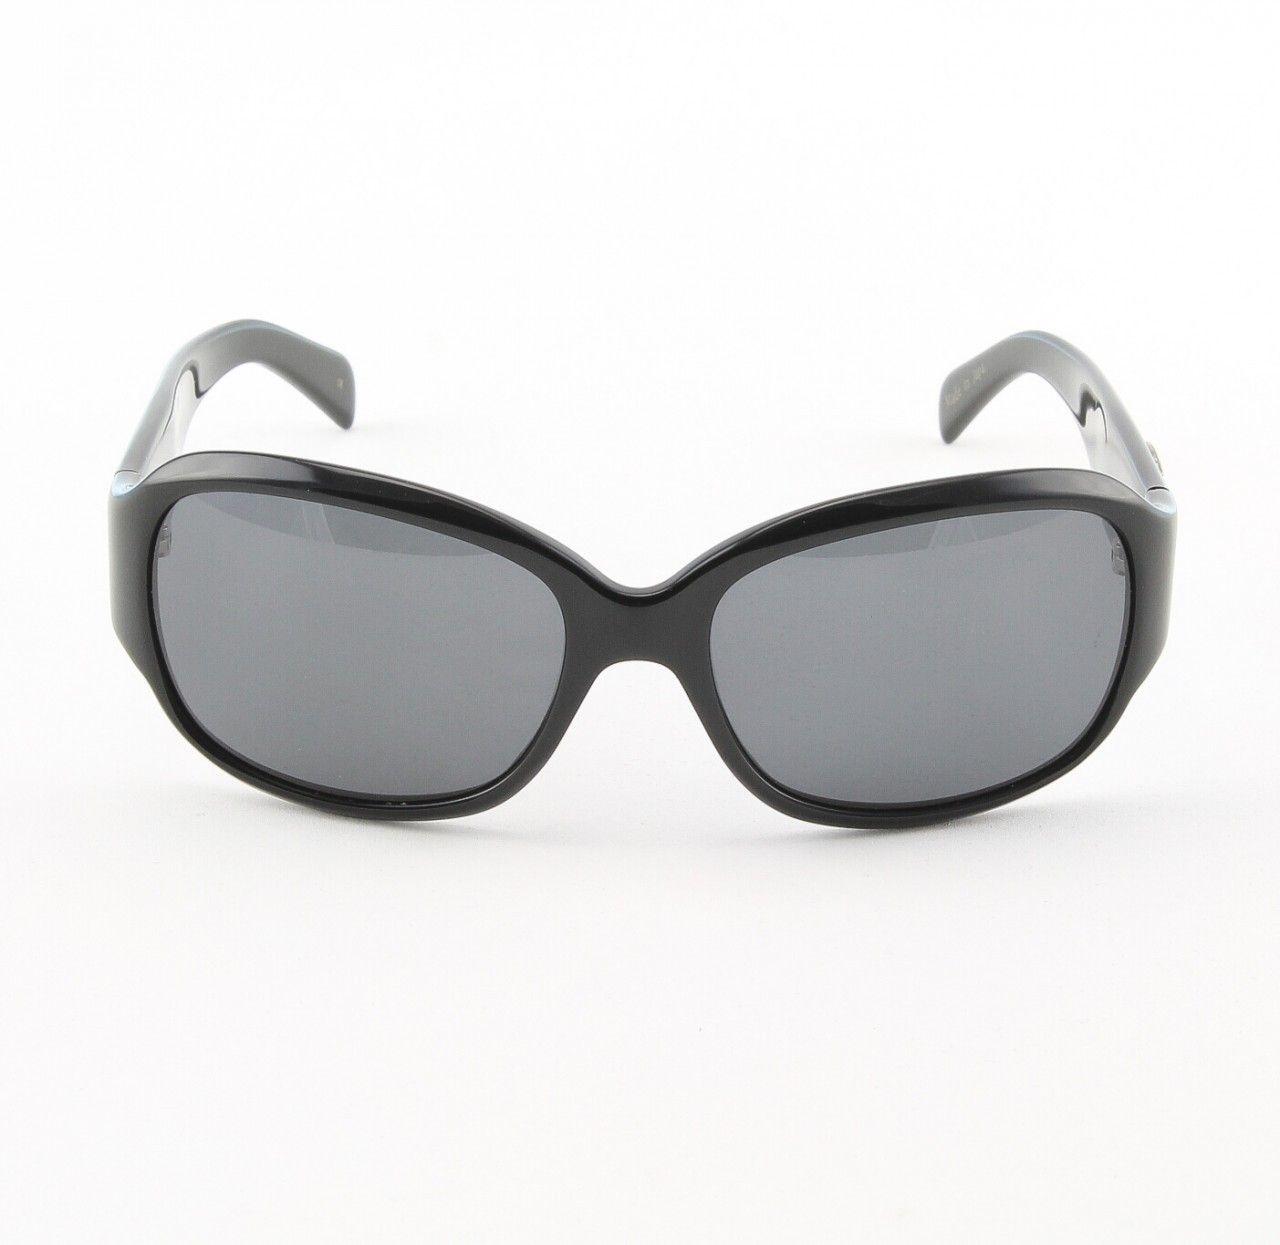 ce2857b663 Loree Rodkin Nicole Sunglasses by Sama Col. Black with Gray Lenses ...